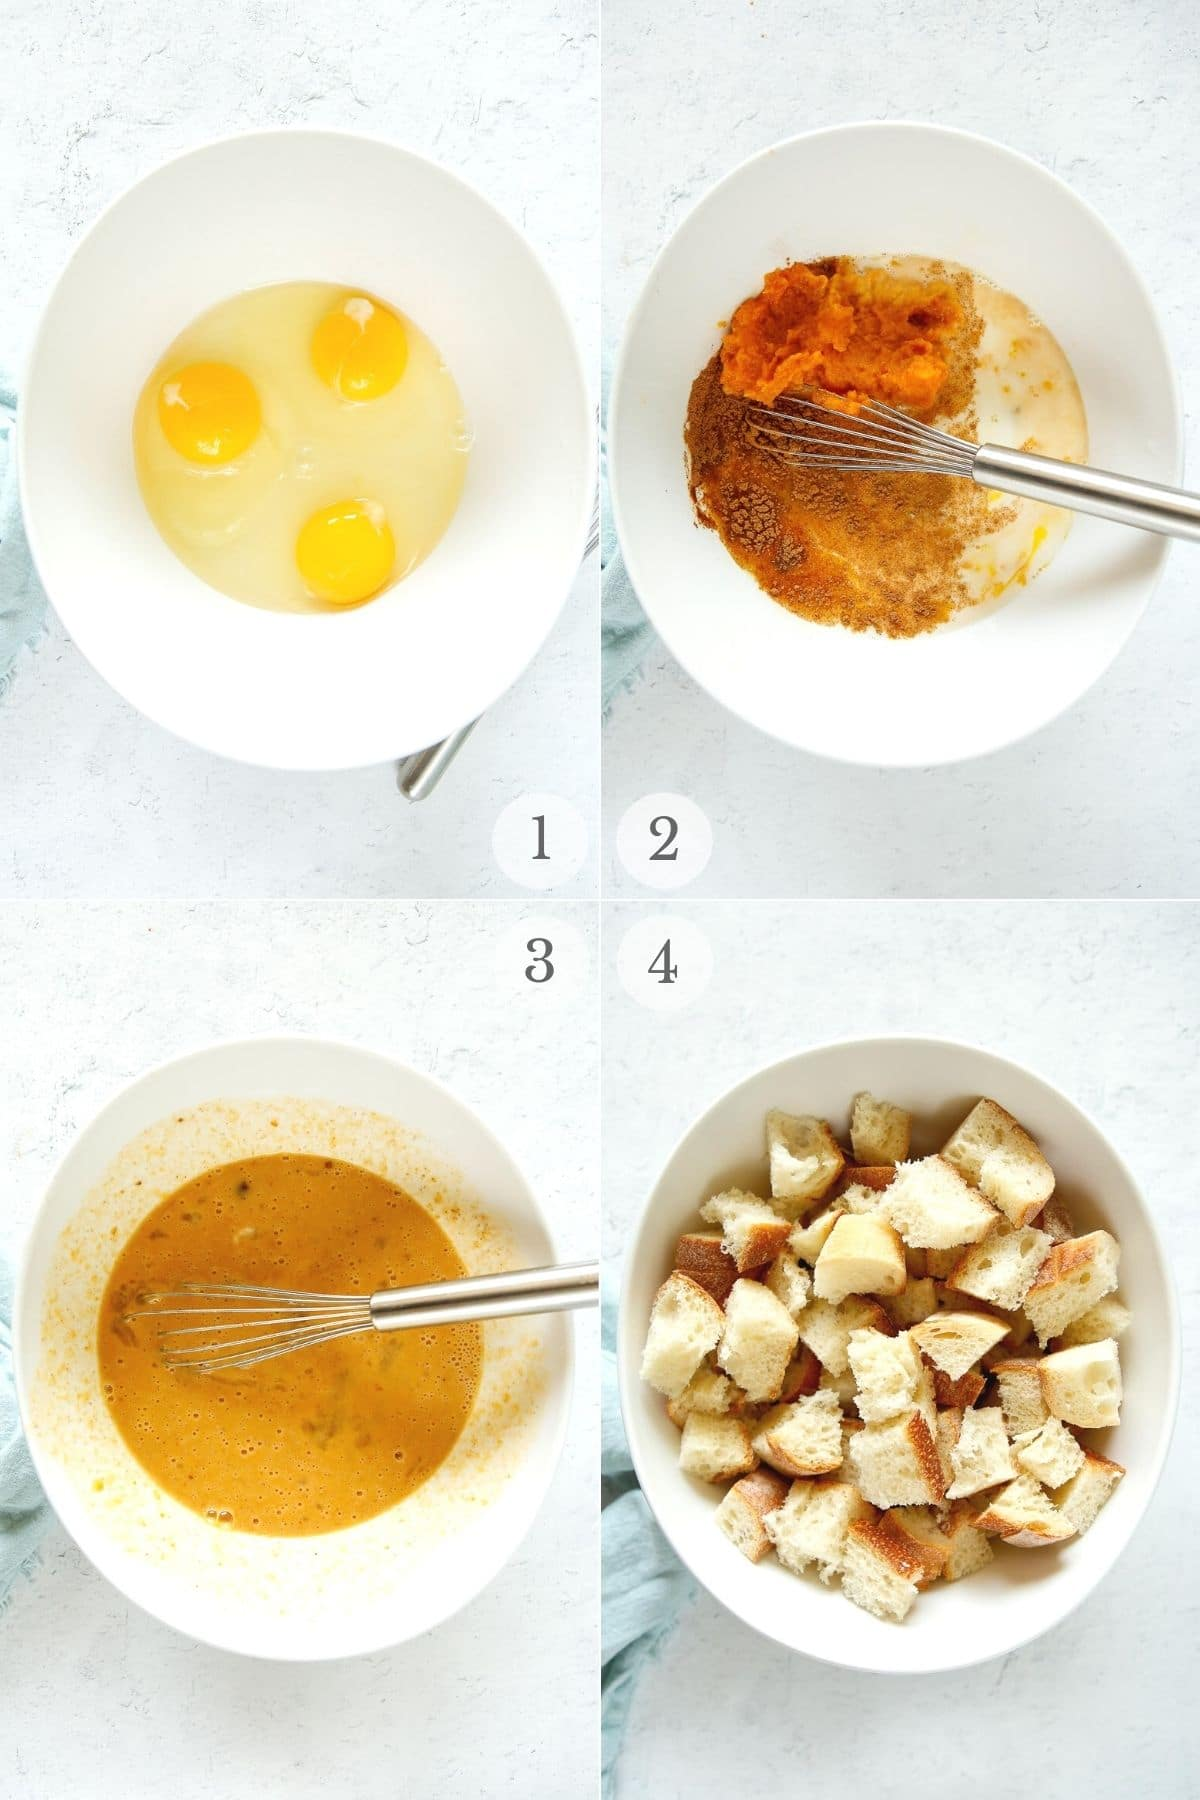 Pumpkin French Toast Casserole (Instant Pot) recipe steps 1-4a